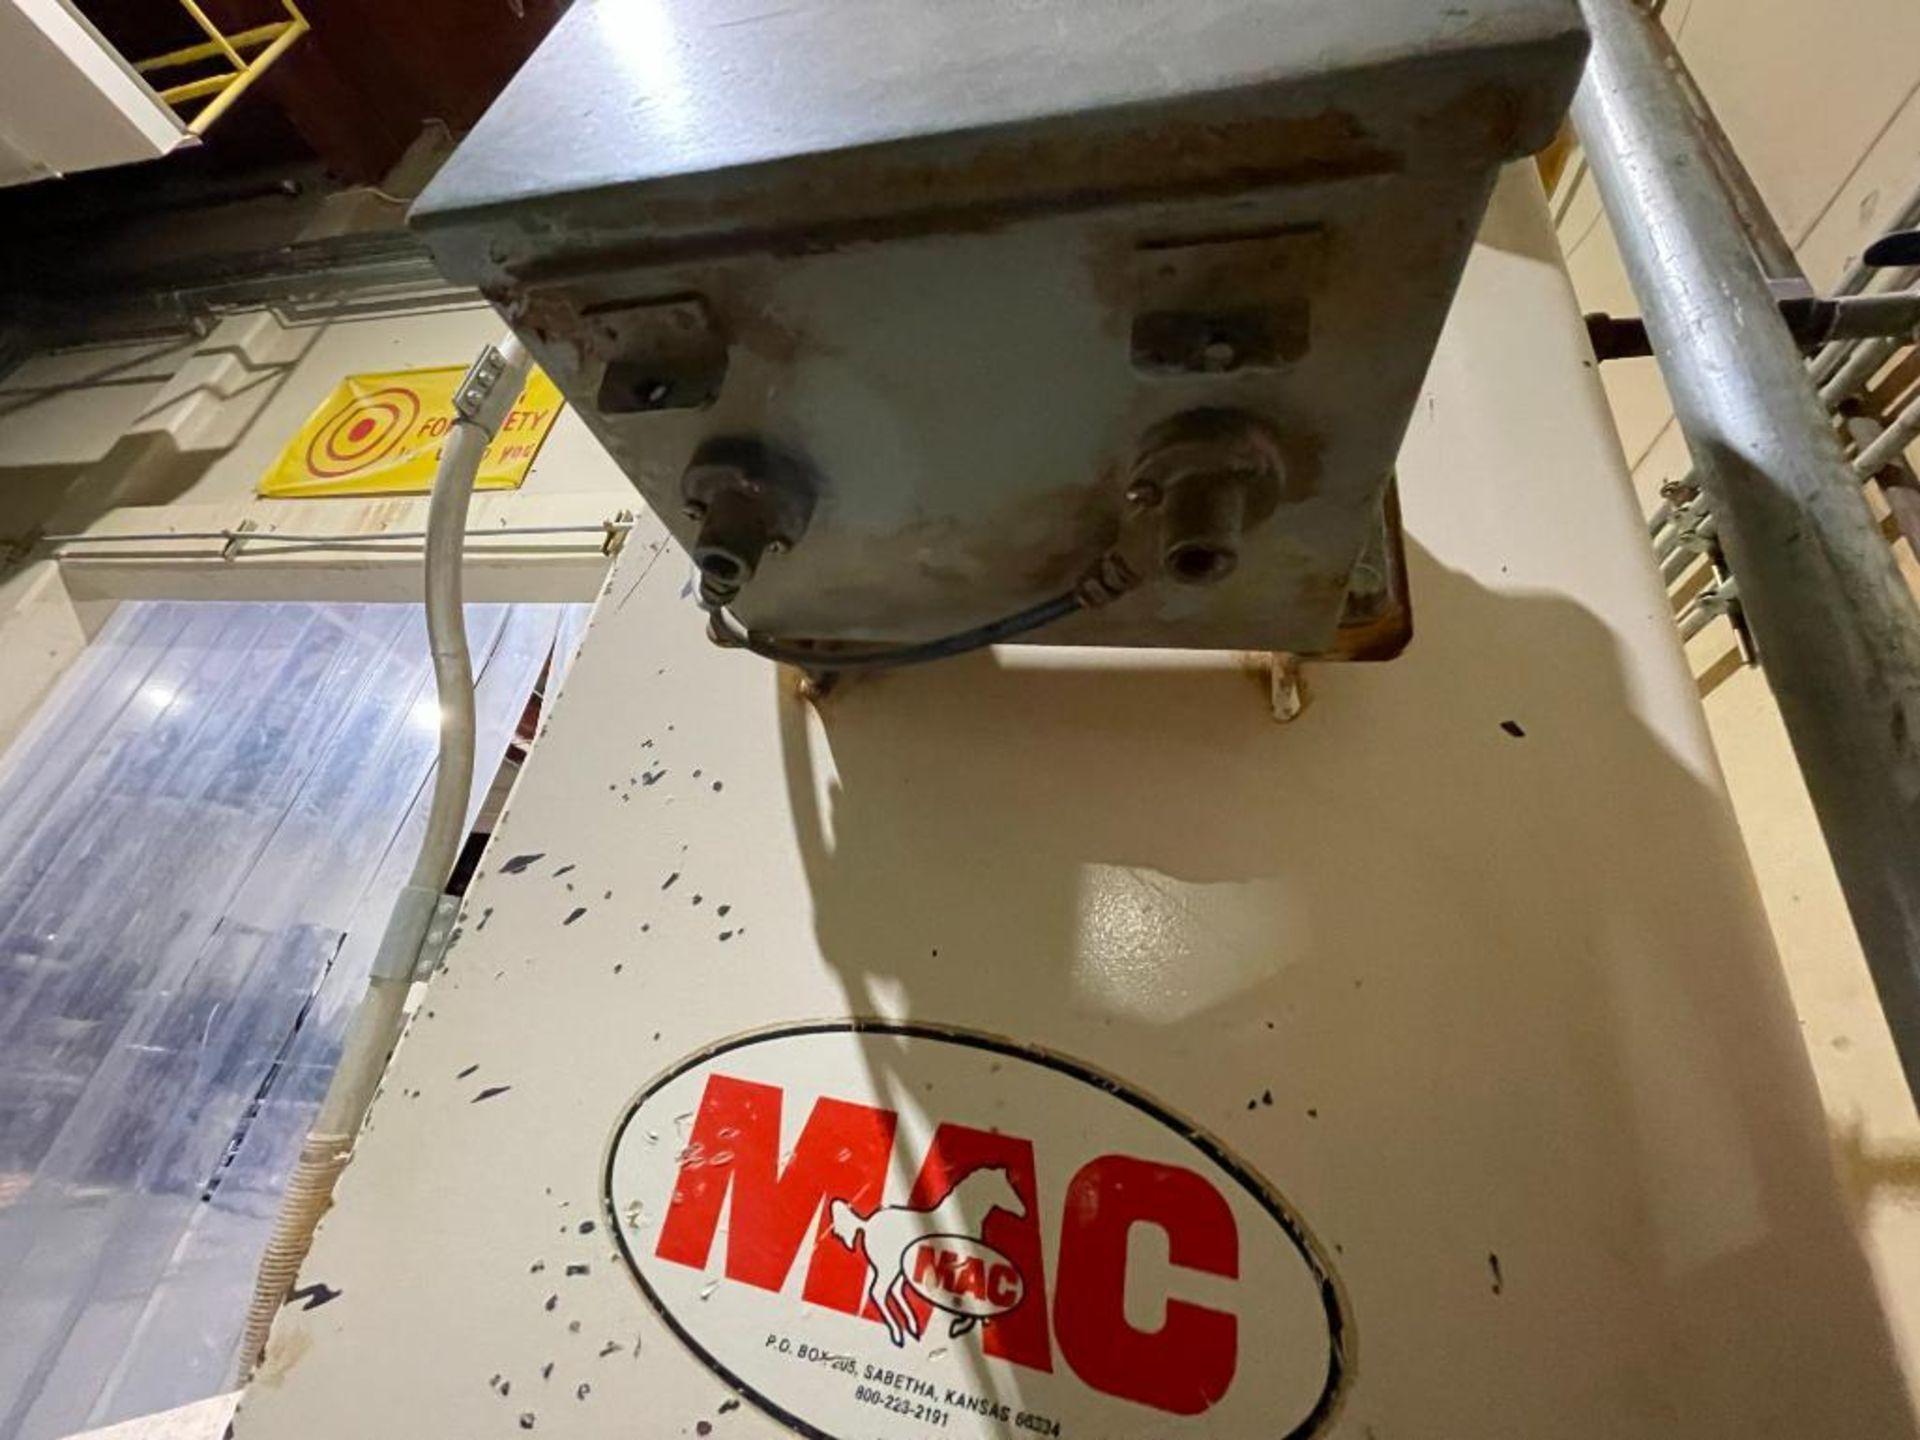 MAC dry ingredients dump station - Image 14 of 24